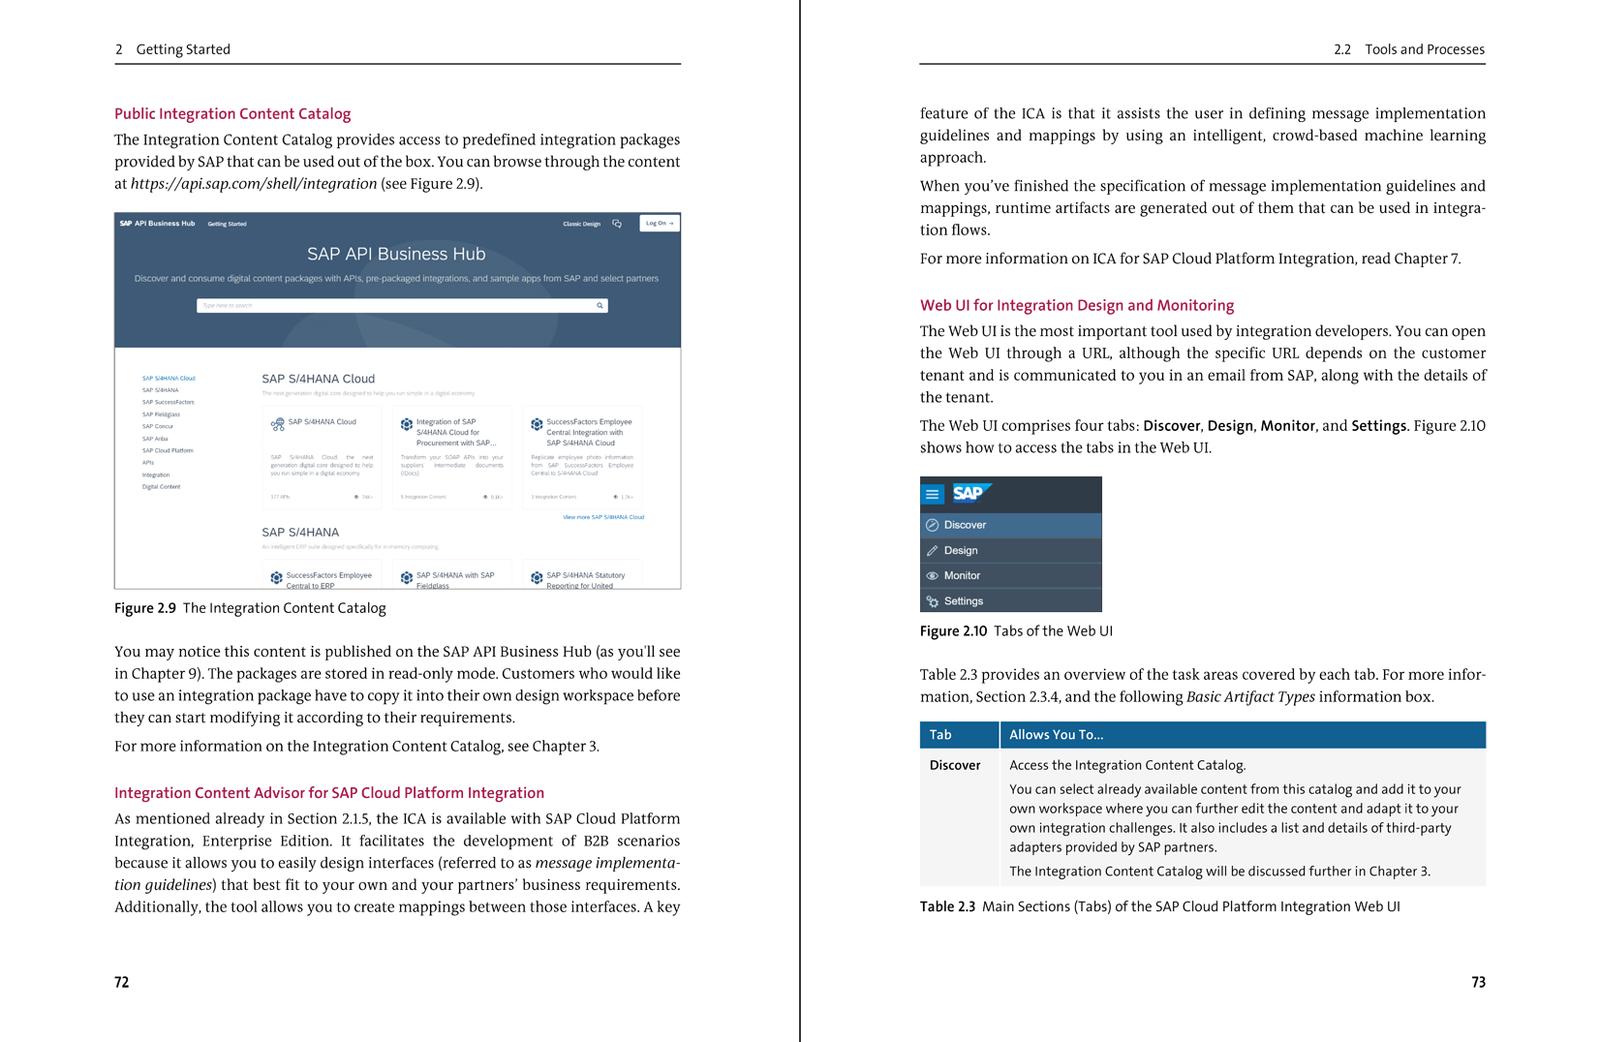 SAP Cloud Platform Integration - The Comprehensive Guide